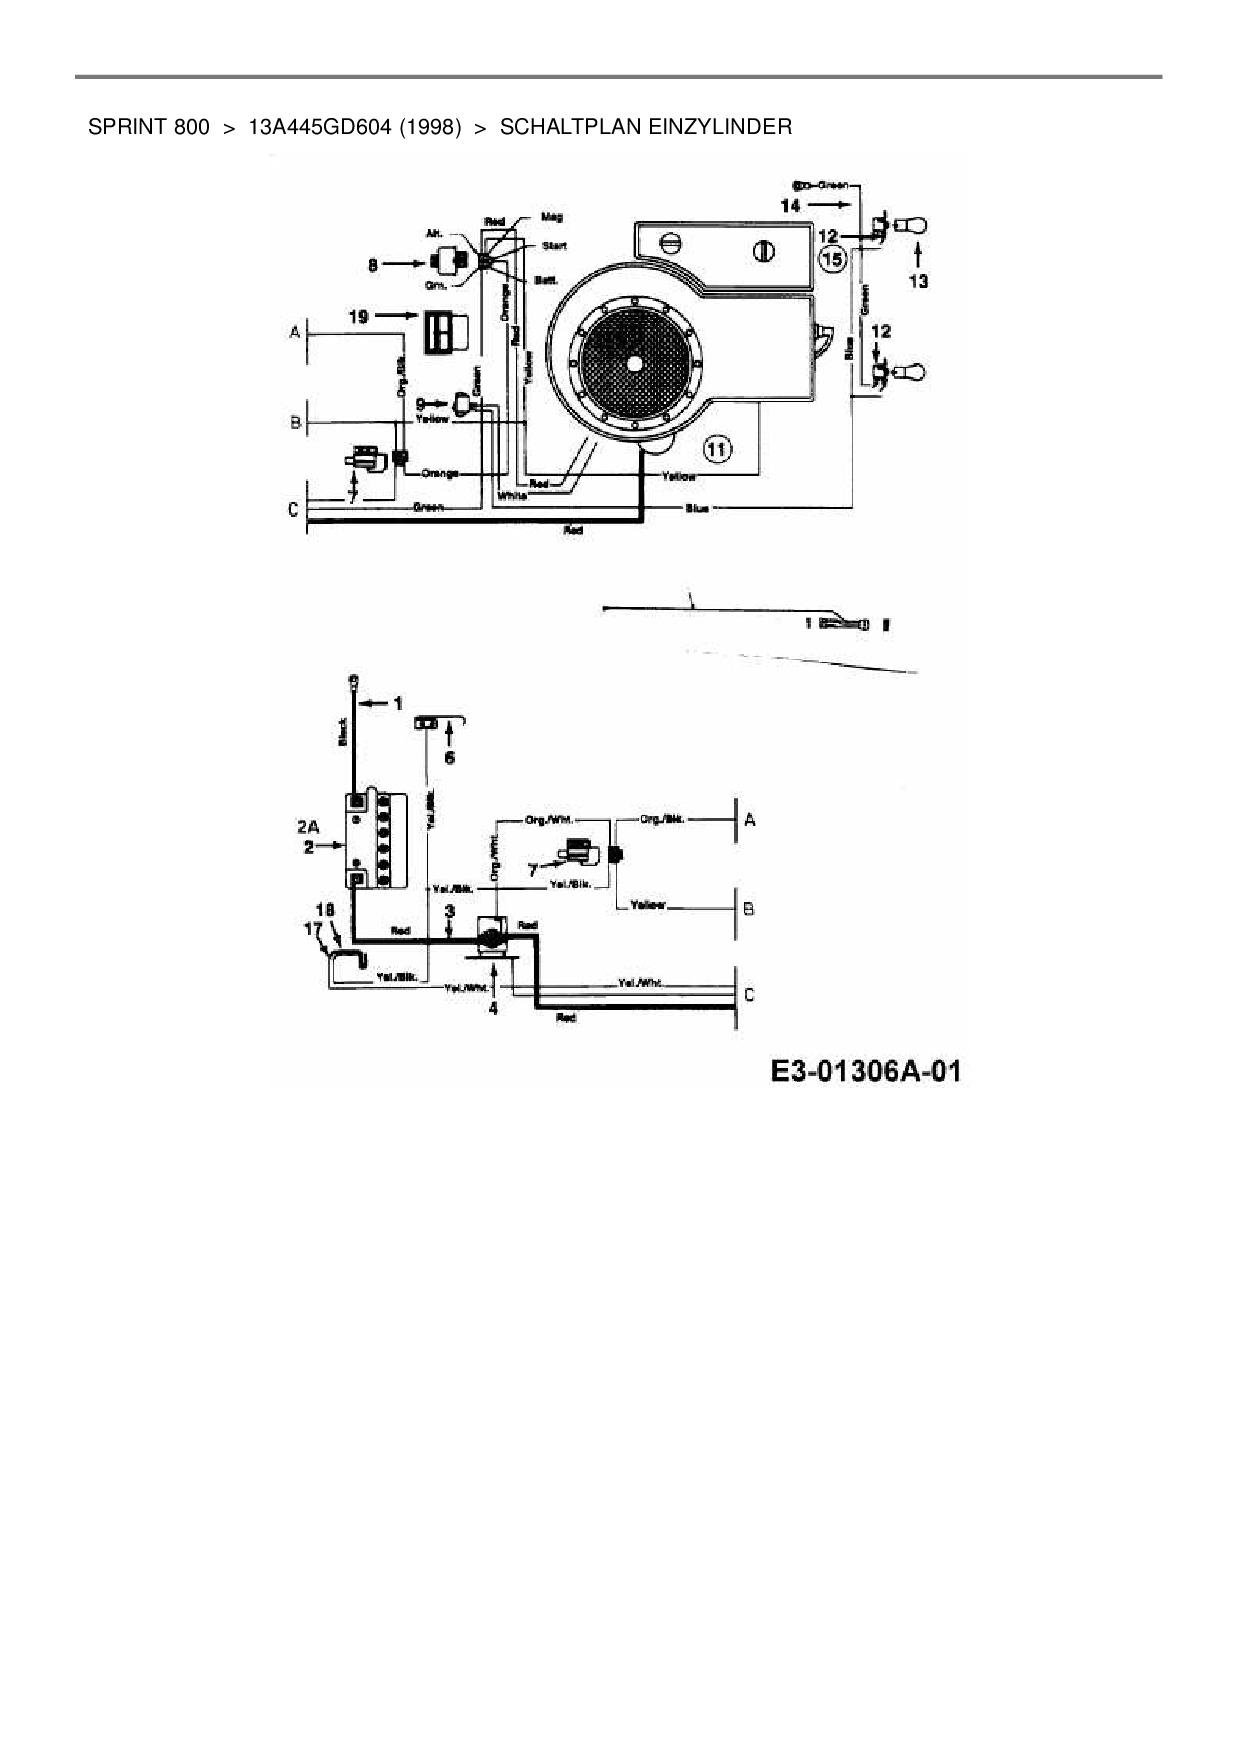 Charmant 1975 Bmw E3 Schaltpläne Ideen - Schaltplan Serie Circuit ...